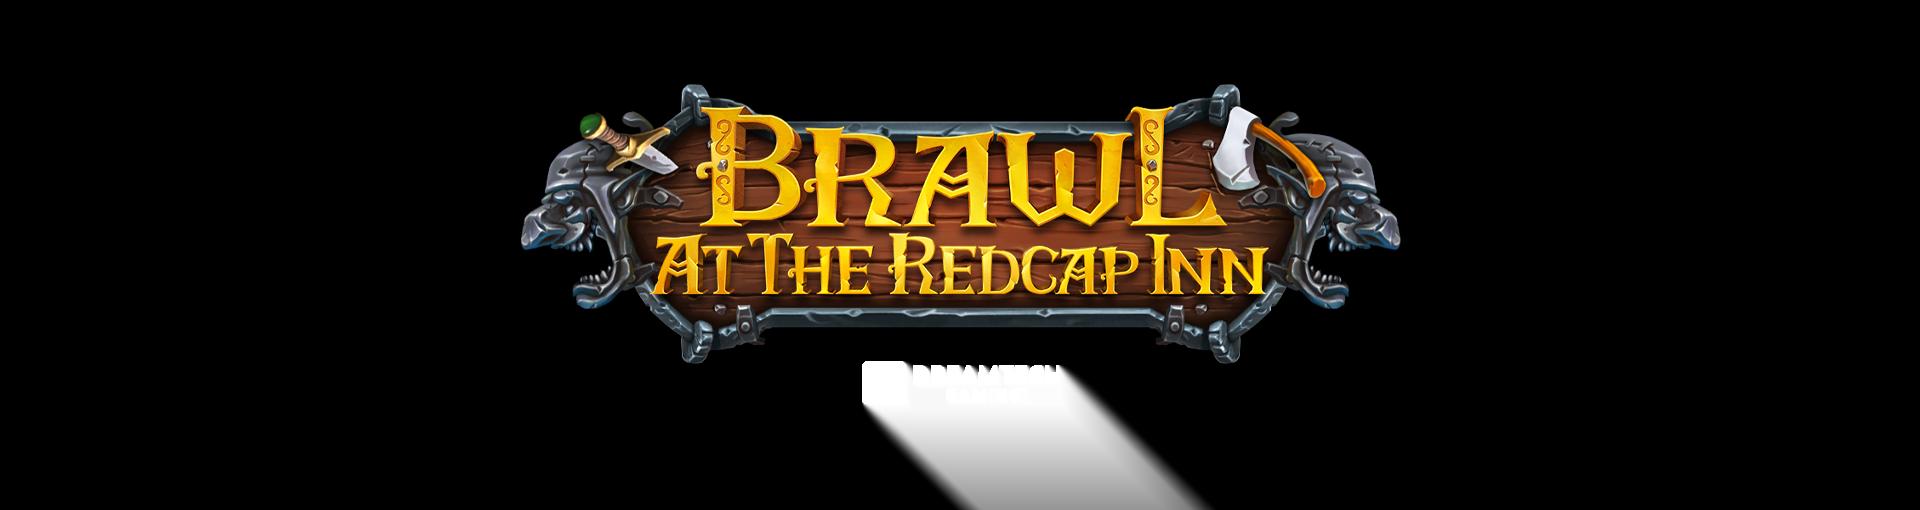 brawl_at_the_redcap_inn_Yggdrasil-UpcomingGame-Logo-Template-1920x510px